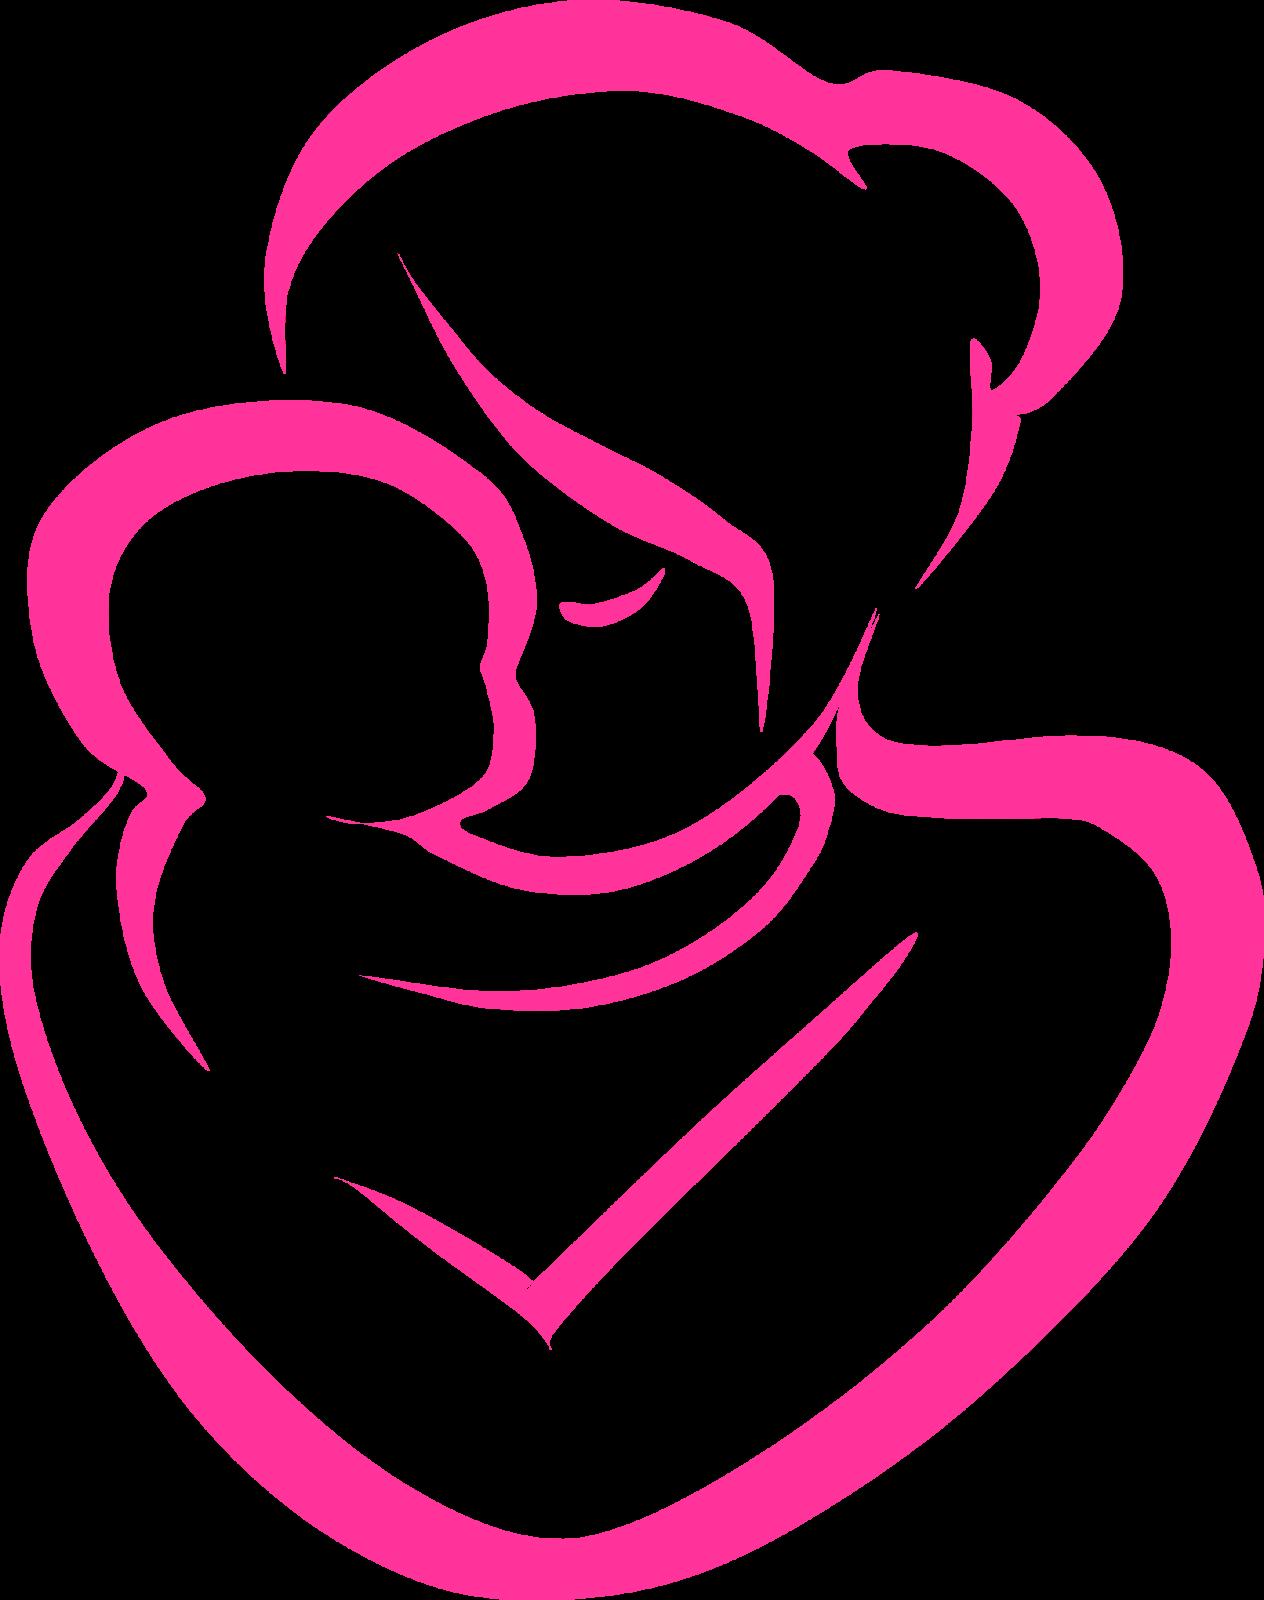 Pregnancy clipart prenatal vitamin, Pregnancy prenatal.